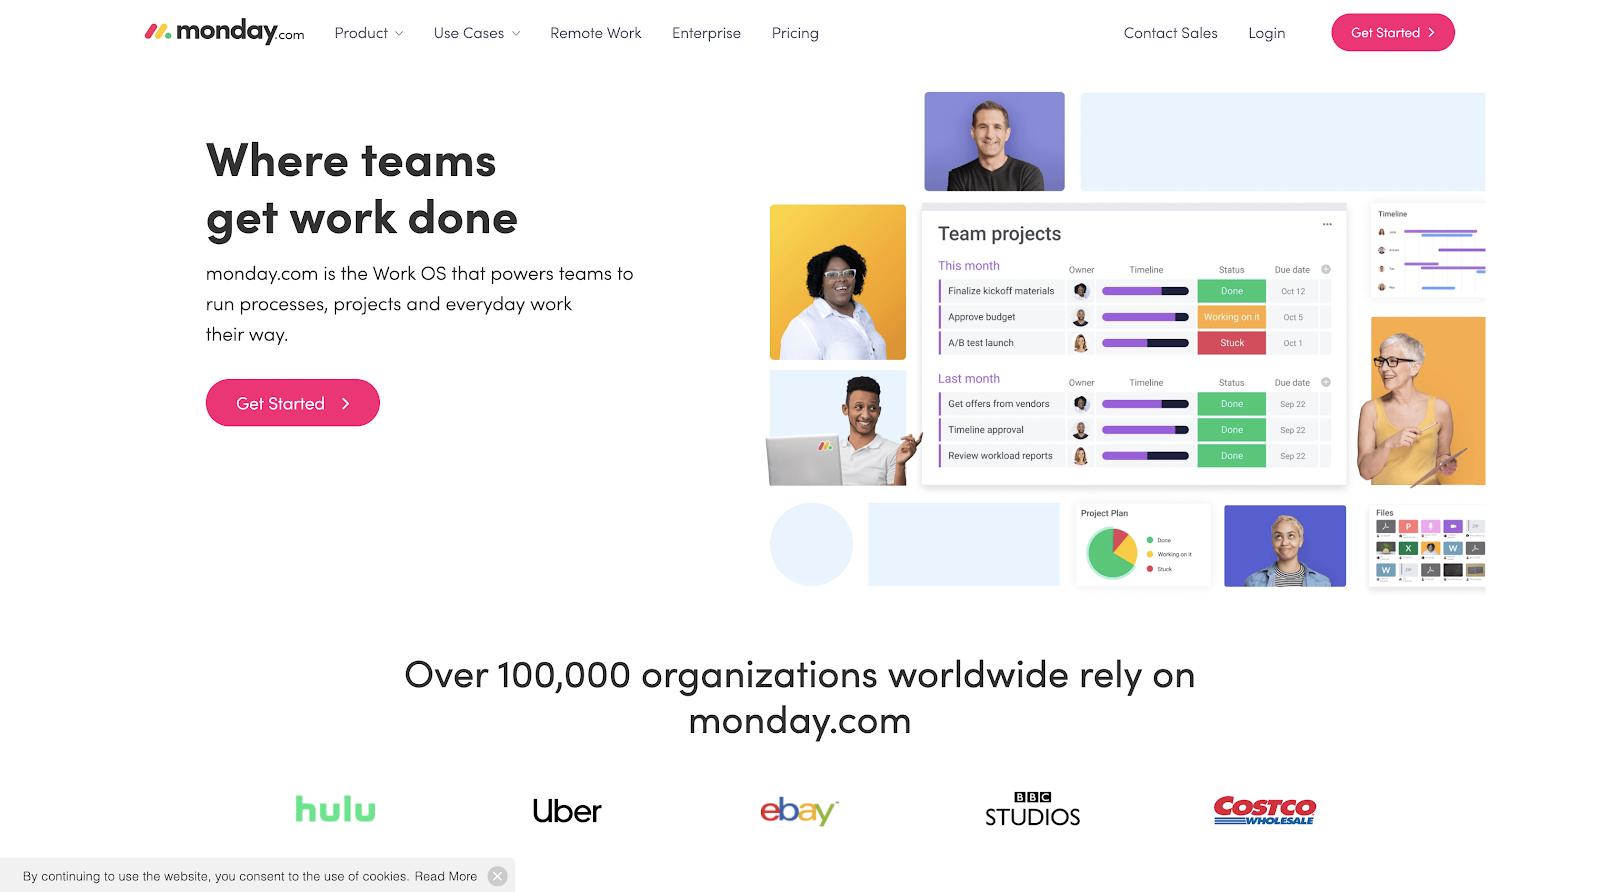 monday.com - Where teams get work done